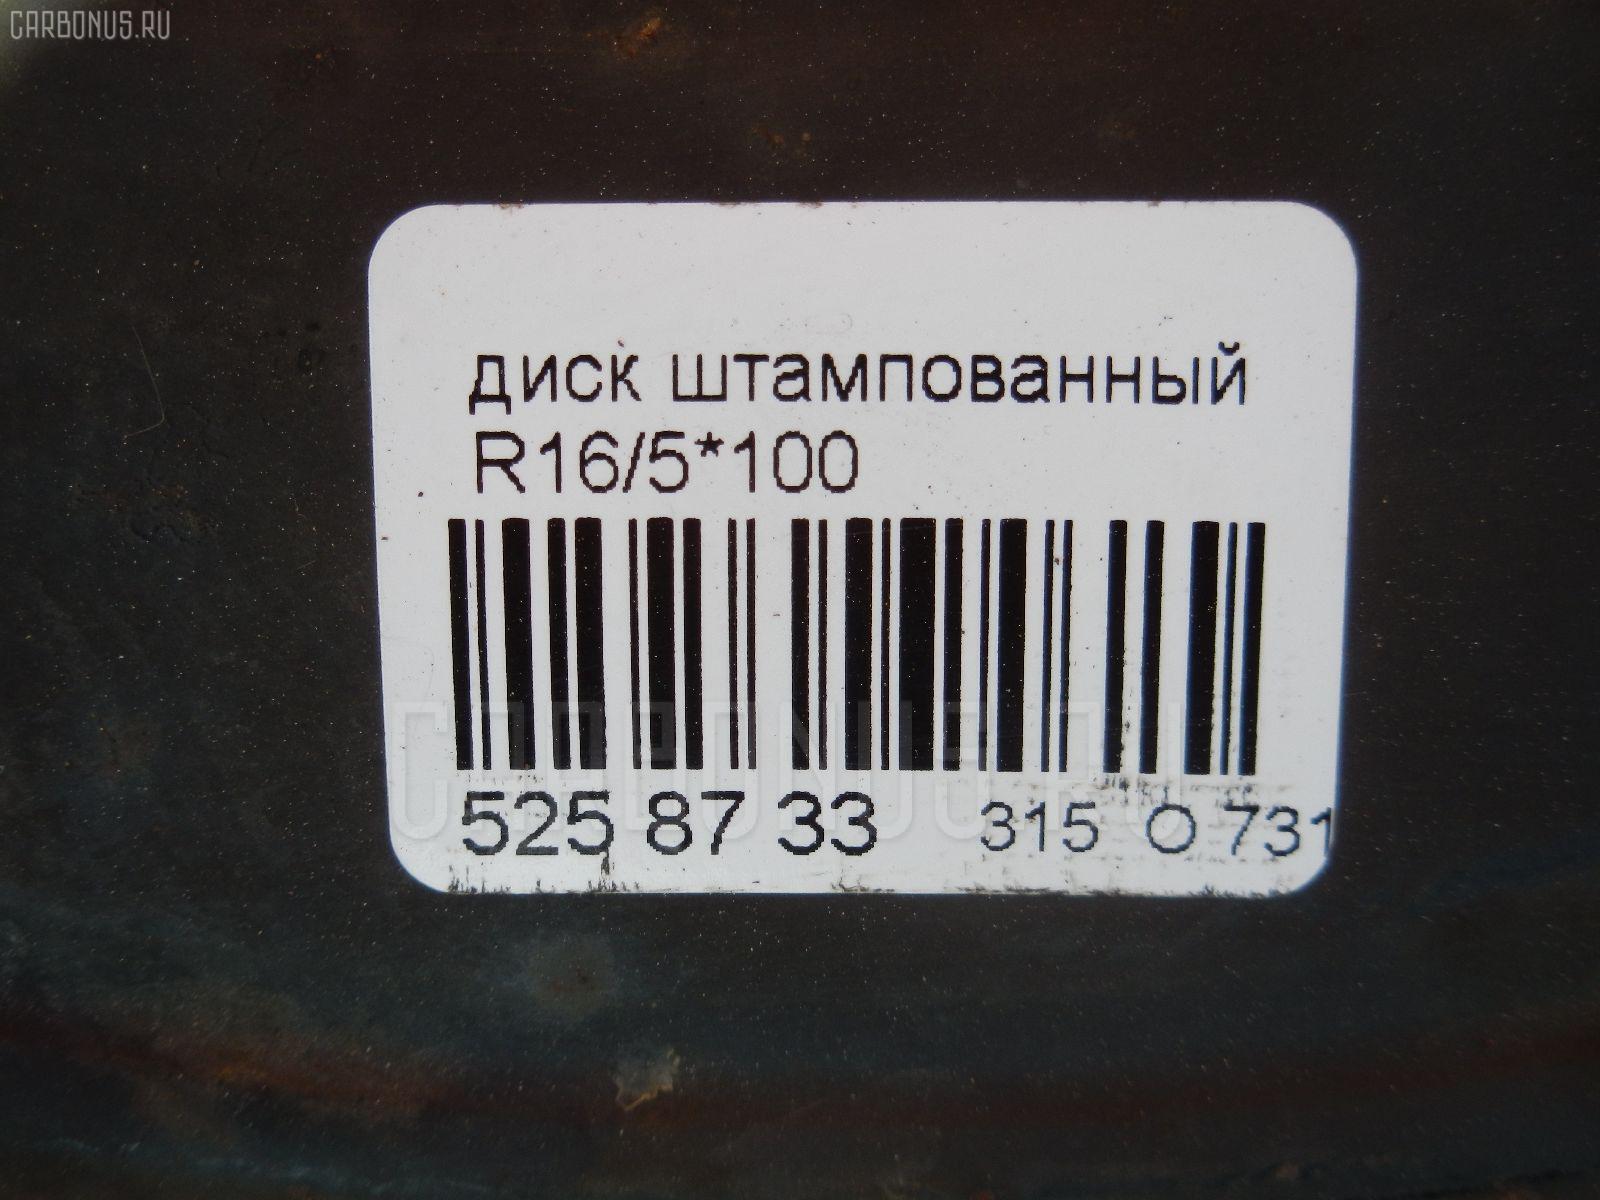 Диск штампованный R16 / 5-100 / ц.о57 Фото 2